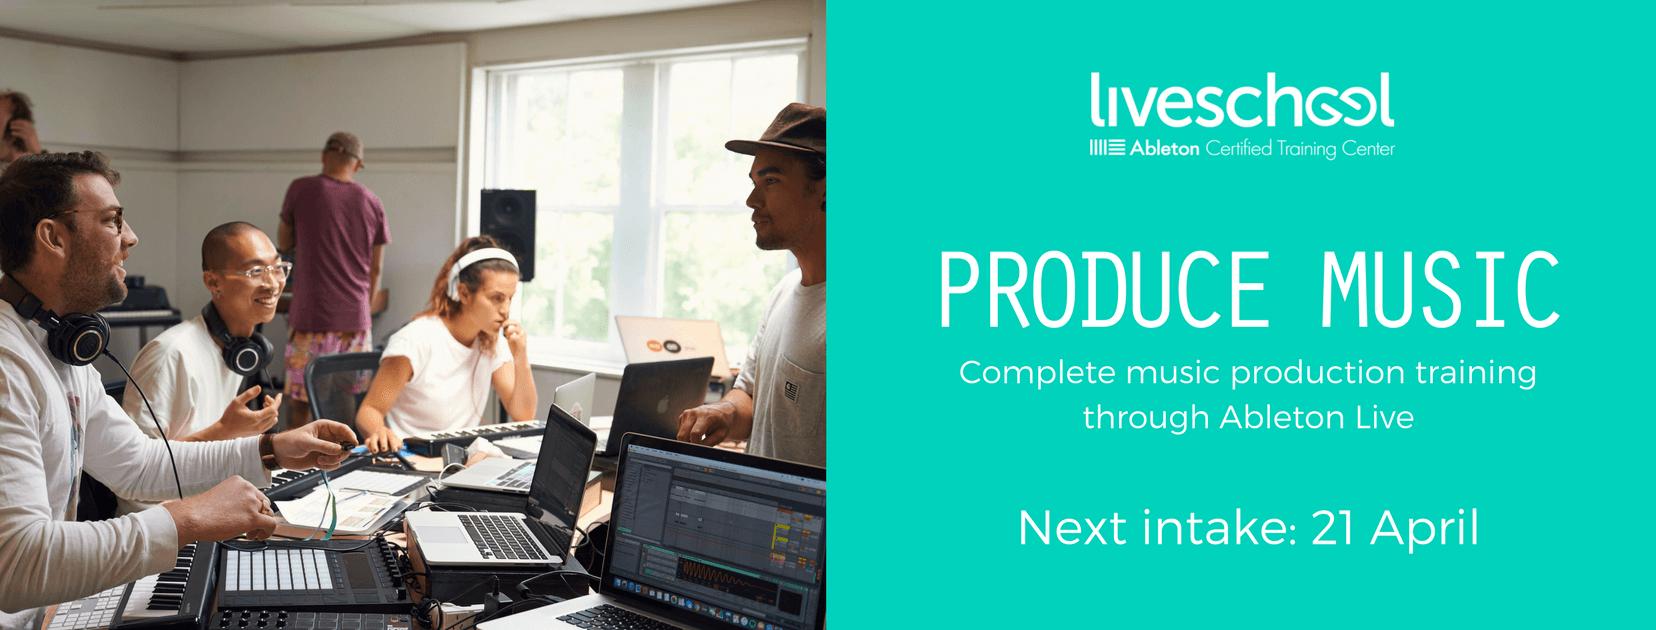 Produce Music Intake: April 21